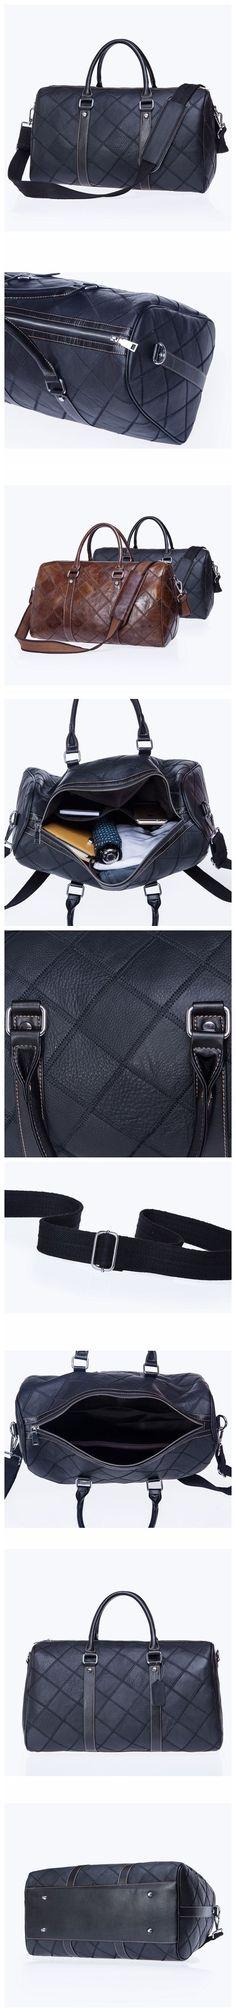 0d1b3075b74 Handmade Top Grain Gym Bag, weekender Duffel Bag, Leather Travel Bag, Luggage  Bag